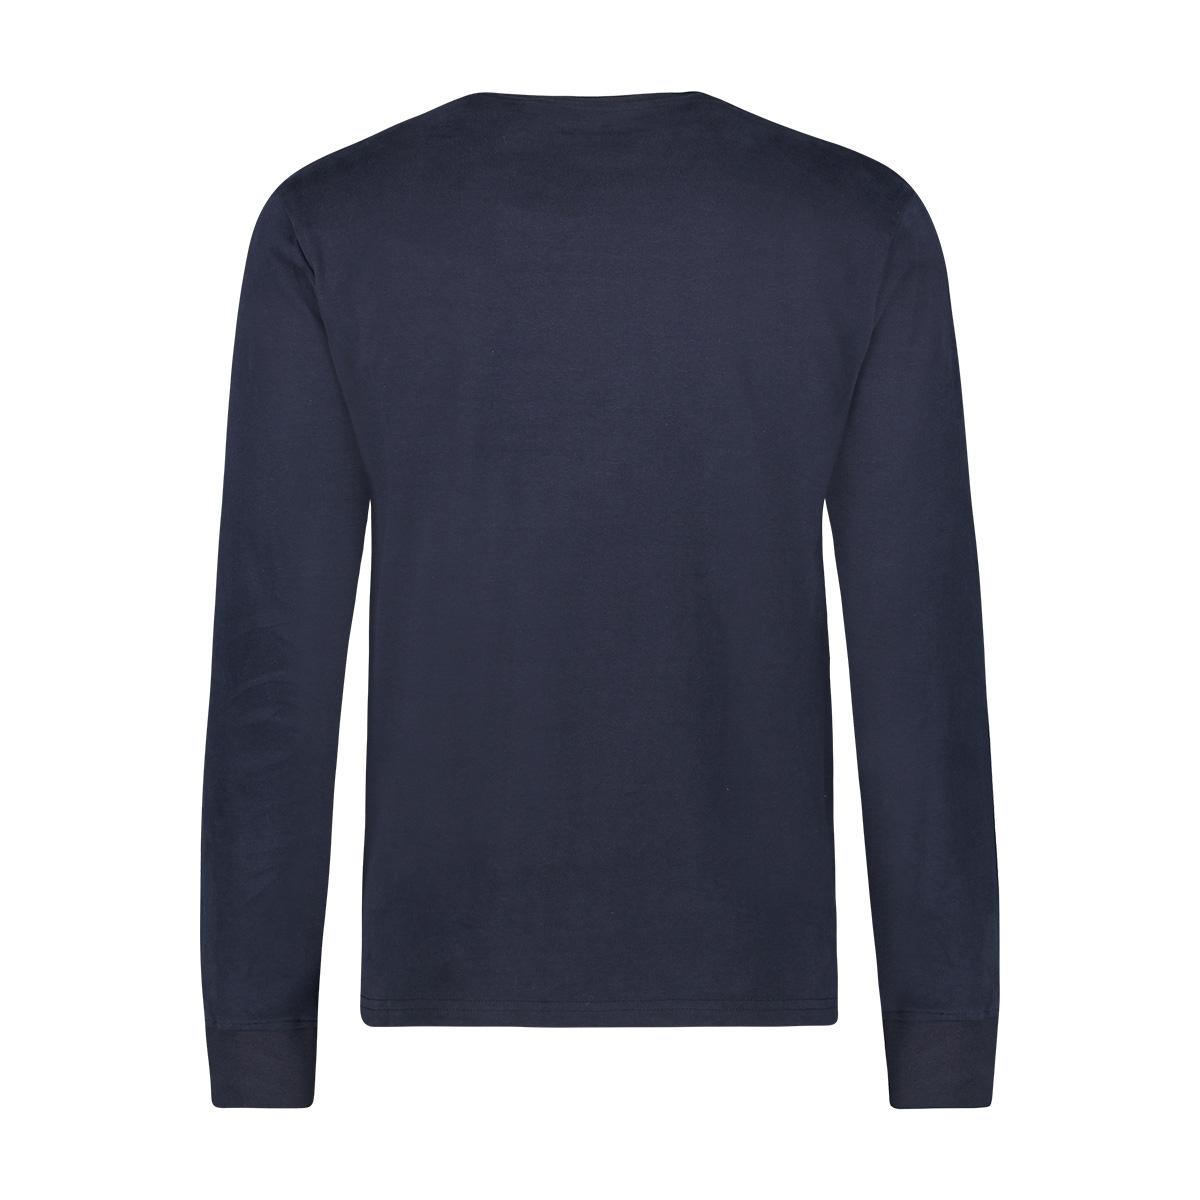 tee quote ls mu12 0003 haze & finn t-shirt dark navy